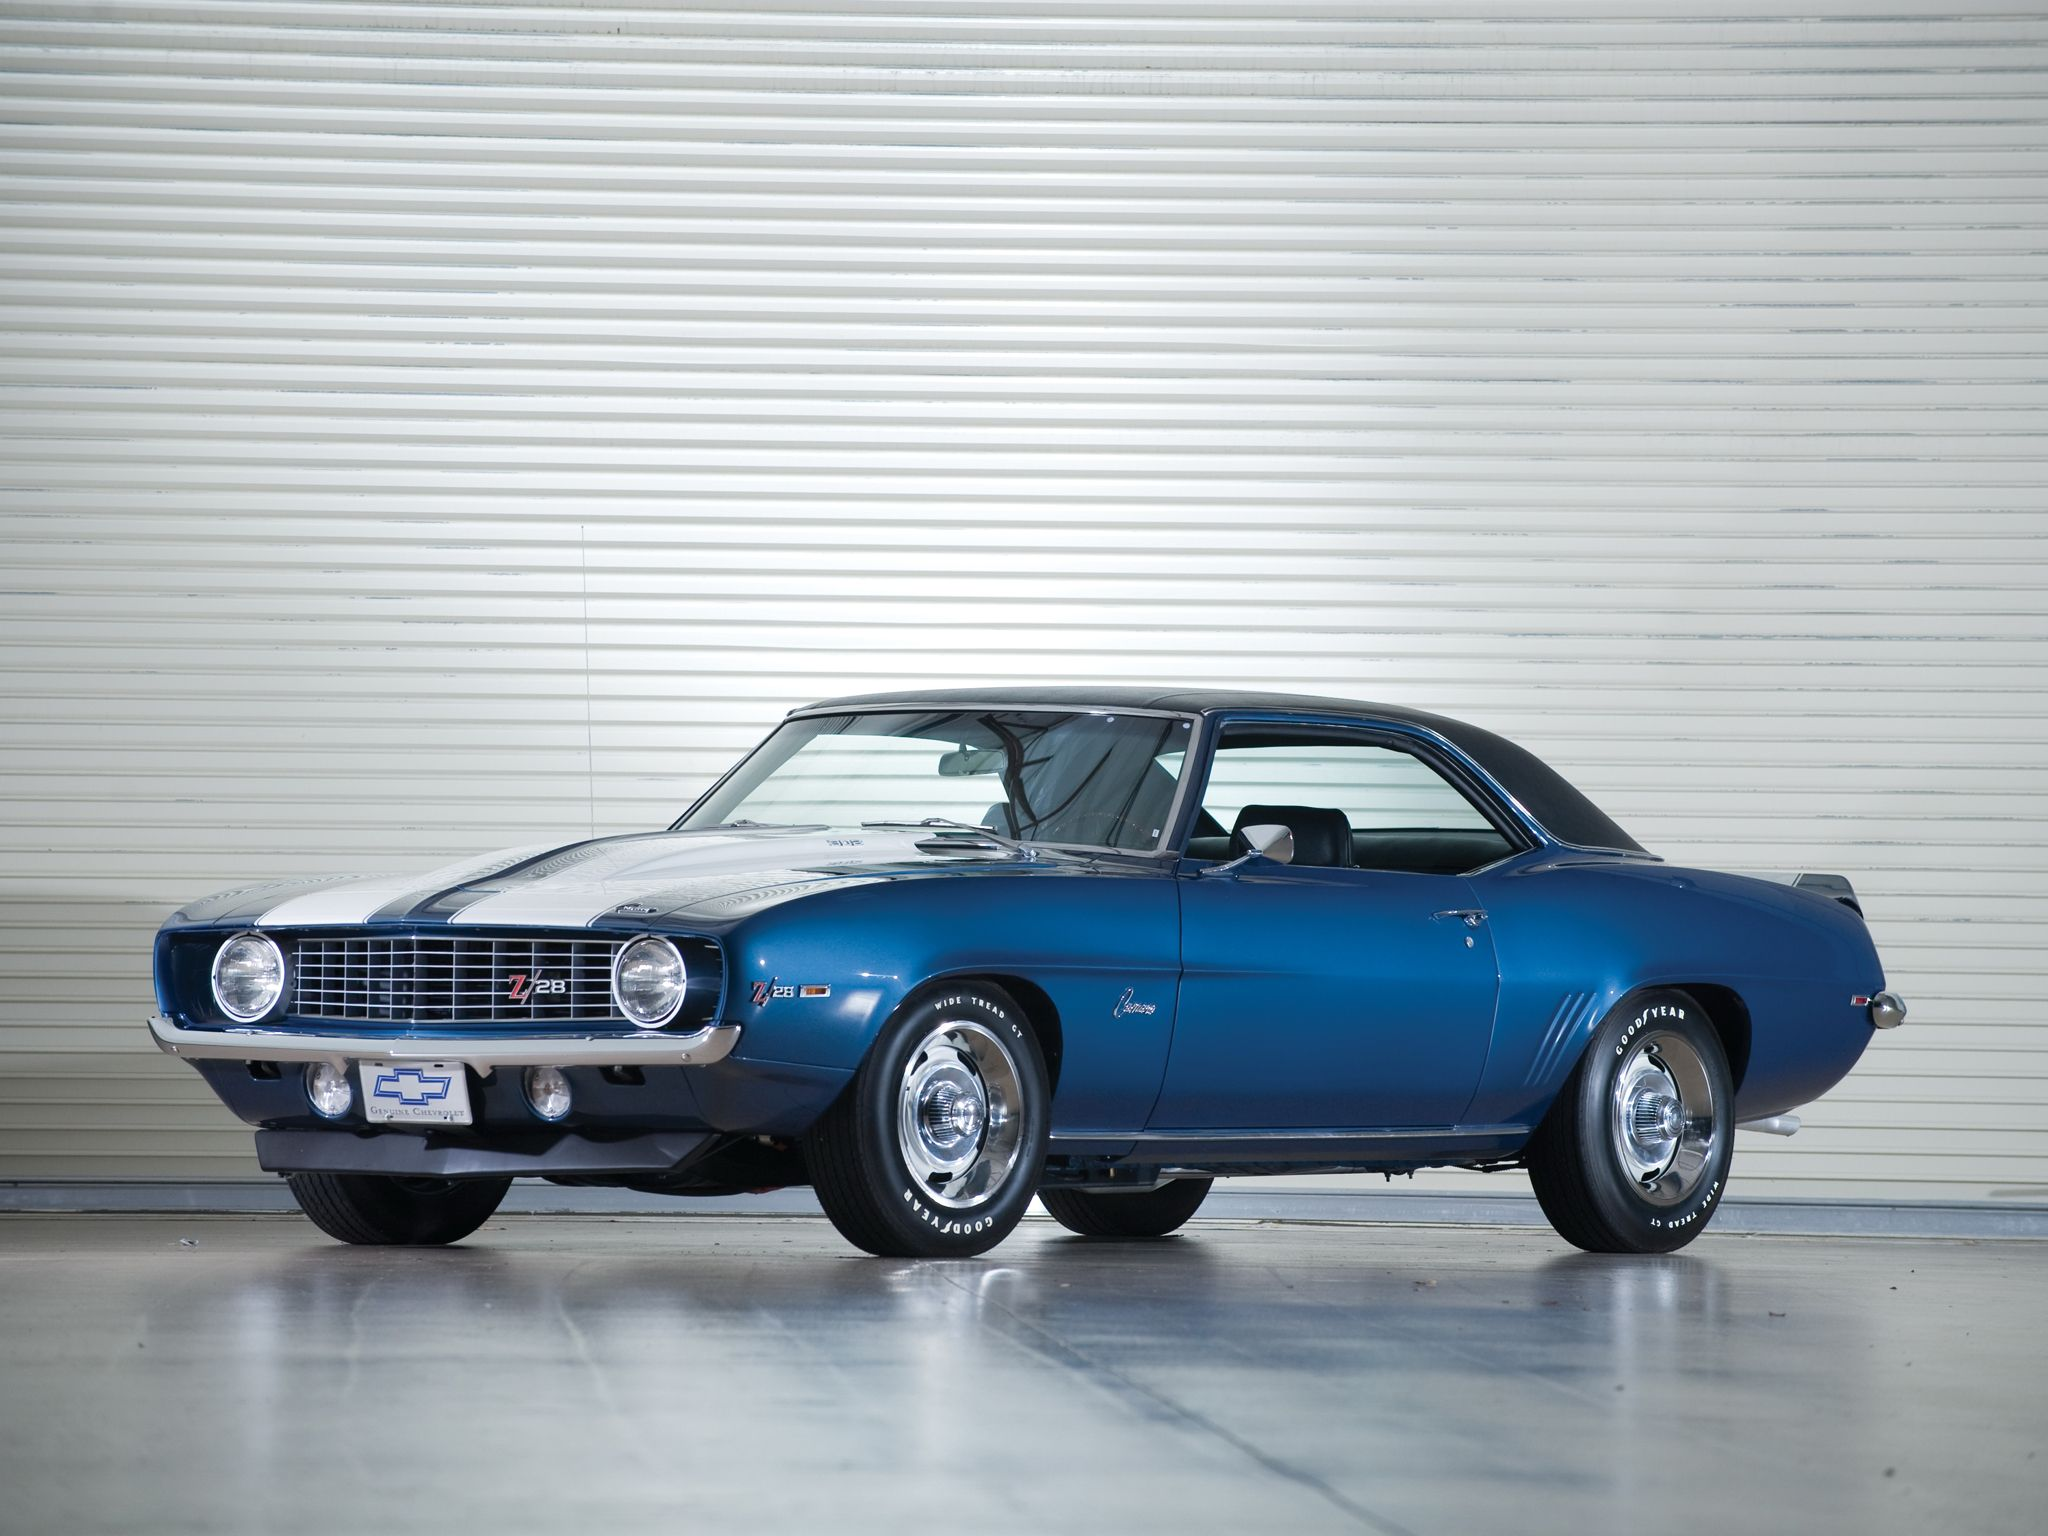 1969 chevy camaro z28 | Chevrolet Wallpapers » Chevrolet Camaro Z28 ...